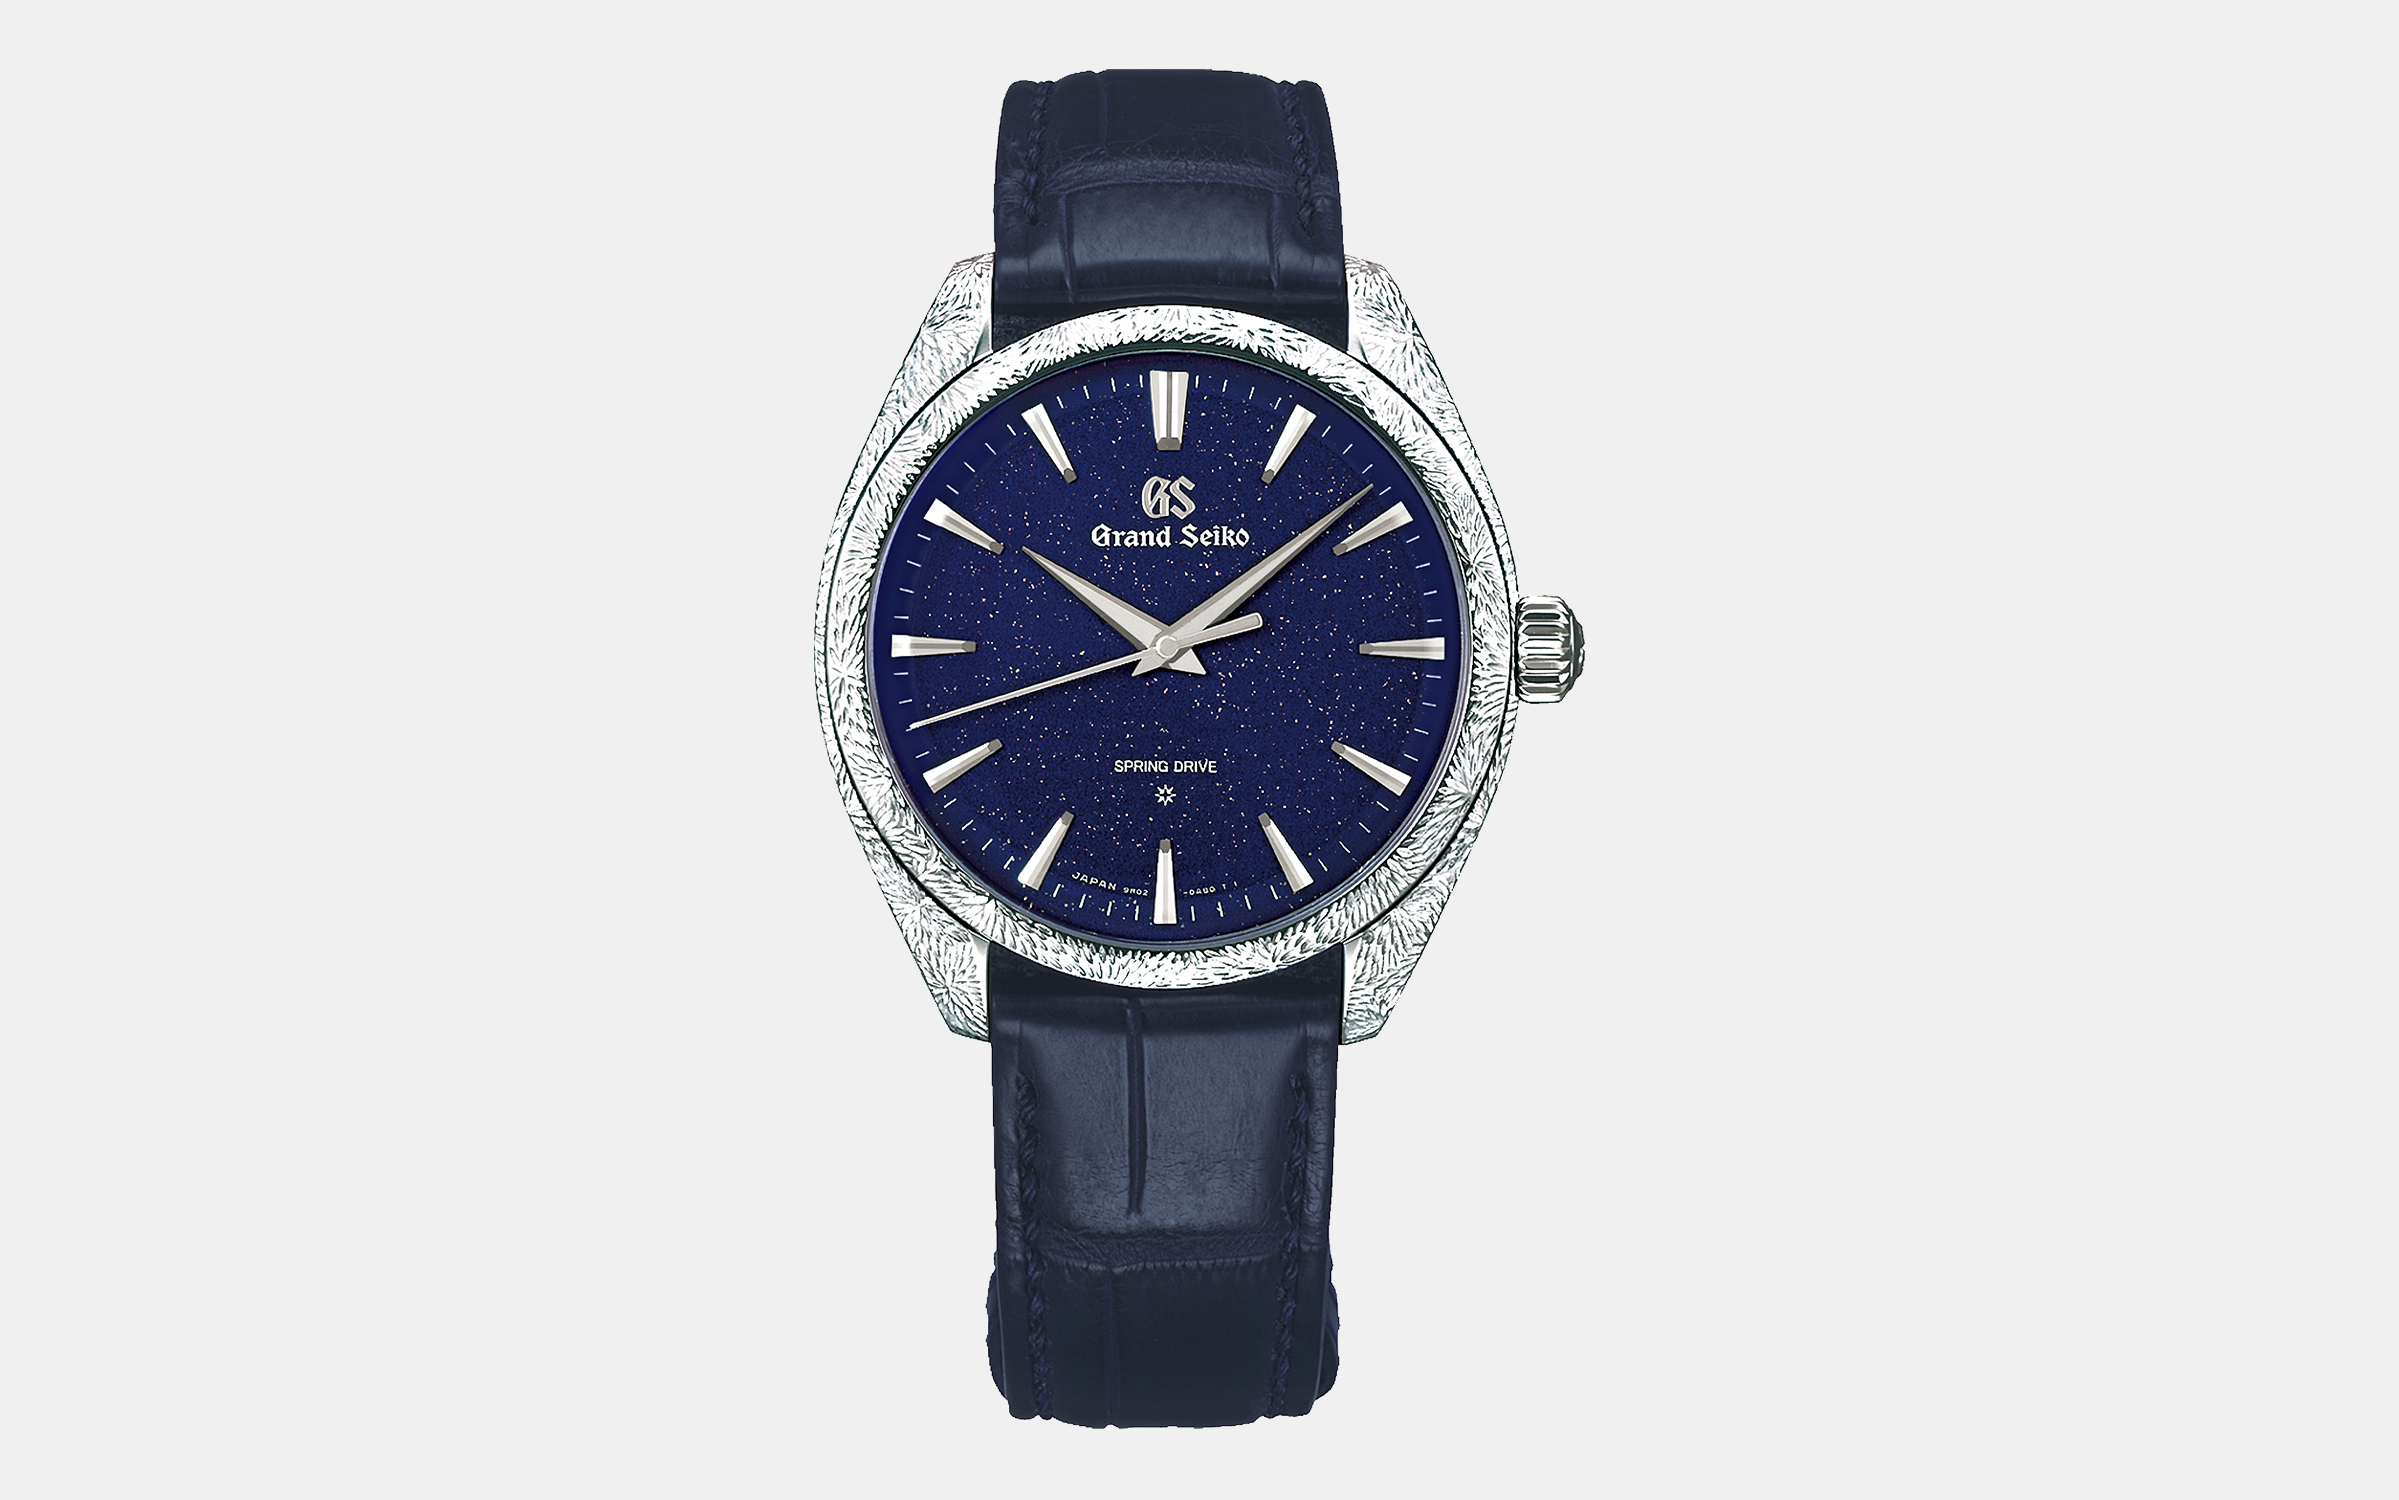 Grand Seiko 140th Anniversary Ref. SBGZ007 Watch